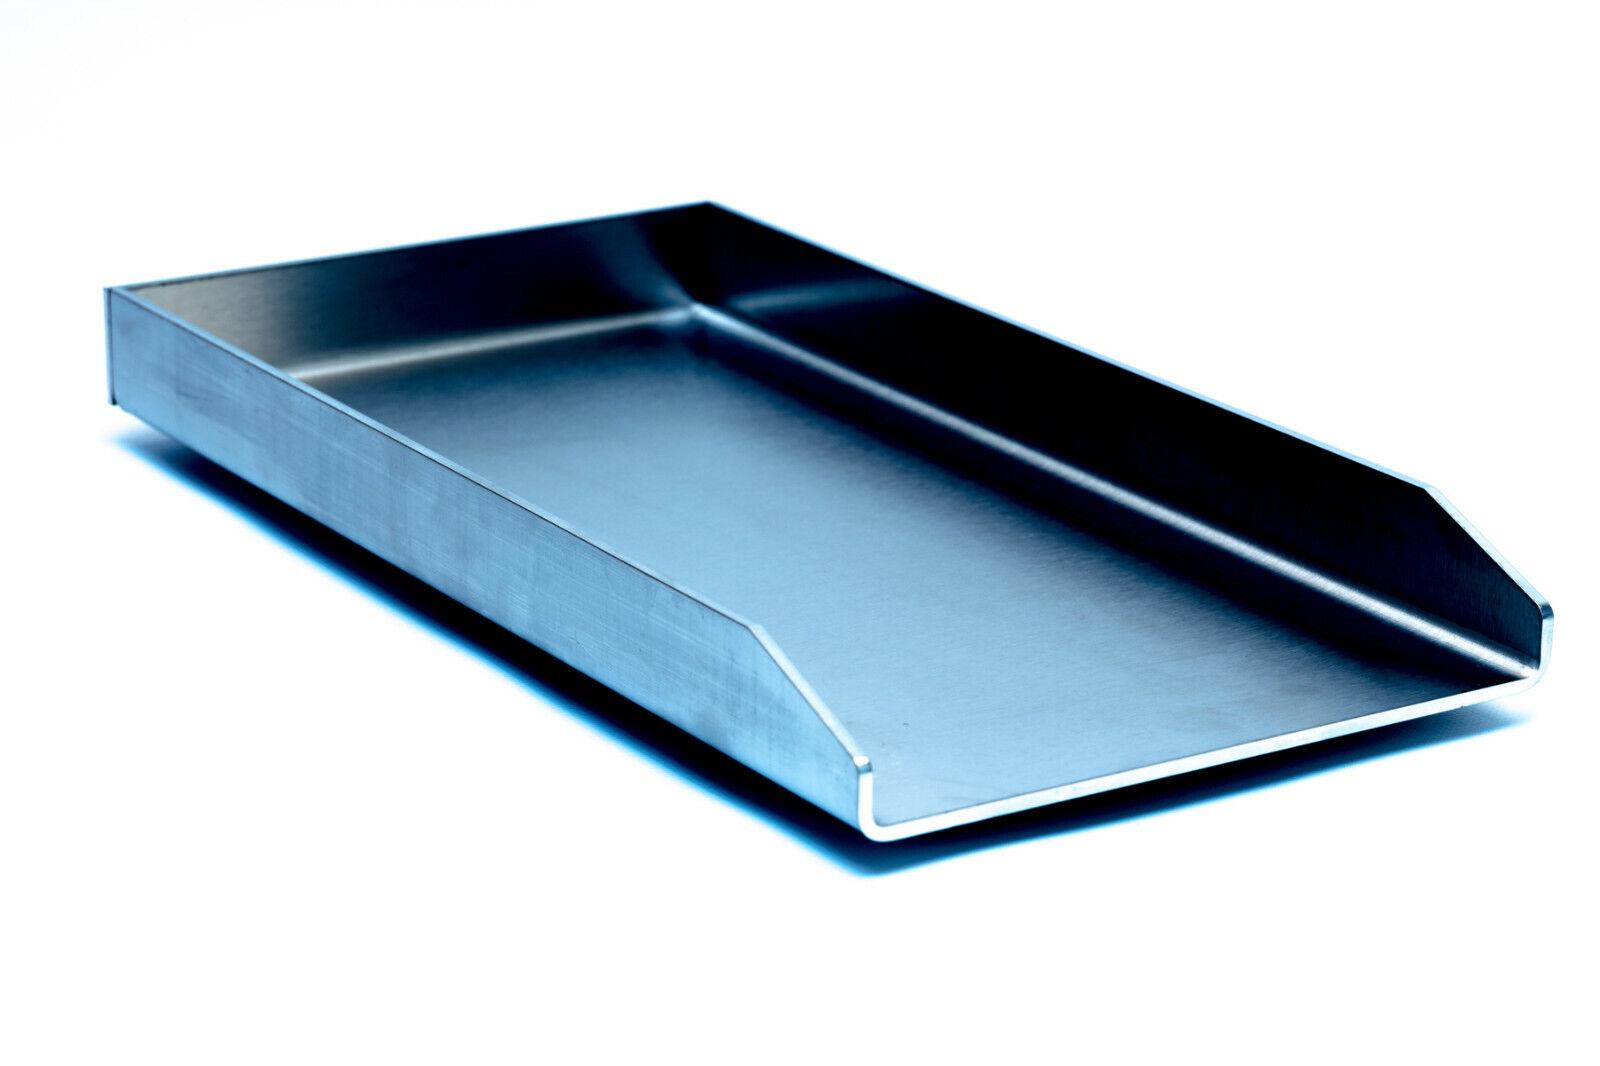 Edelstahl Plancha / Grillplatte / für Weber Genesis II / 480 x 290 x 4mm